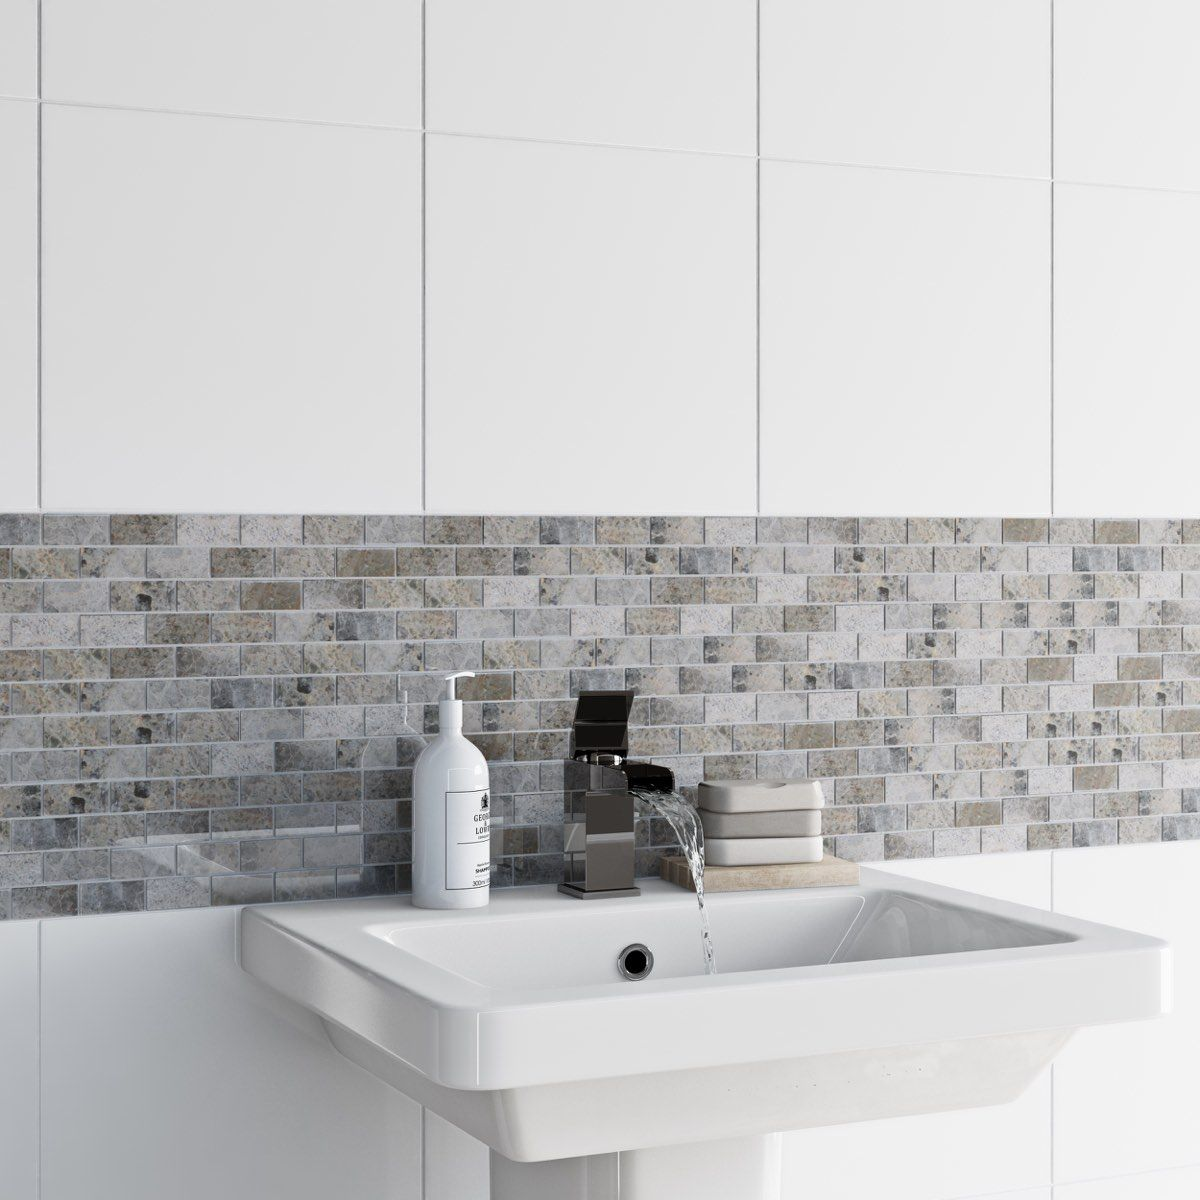 British Ceramic Tile Mosaic stone beige gloss tile 300mm x 300mm - 1 ...